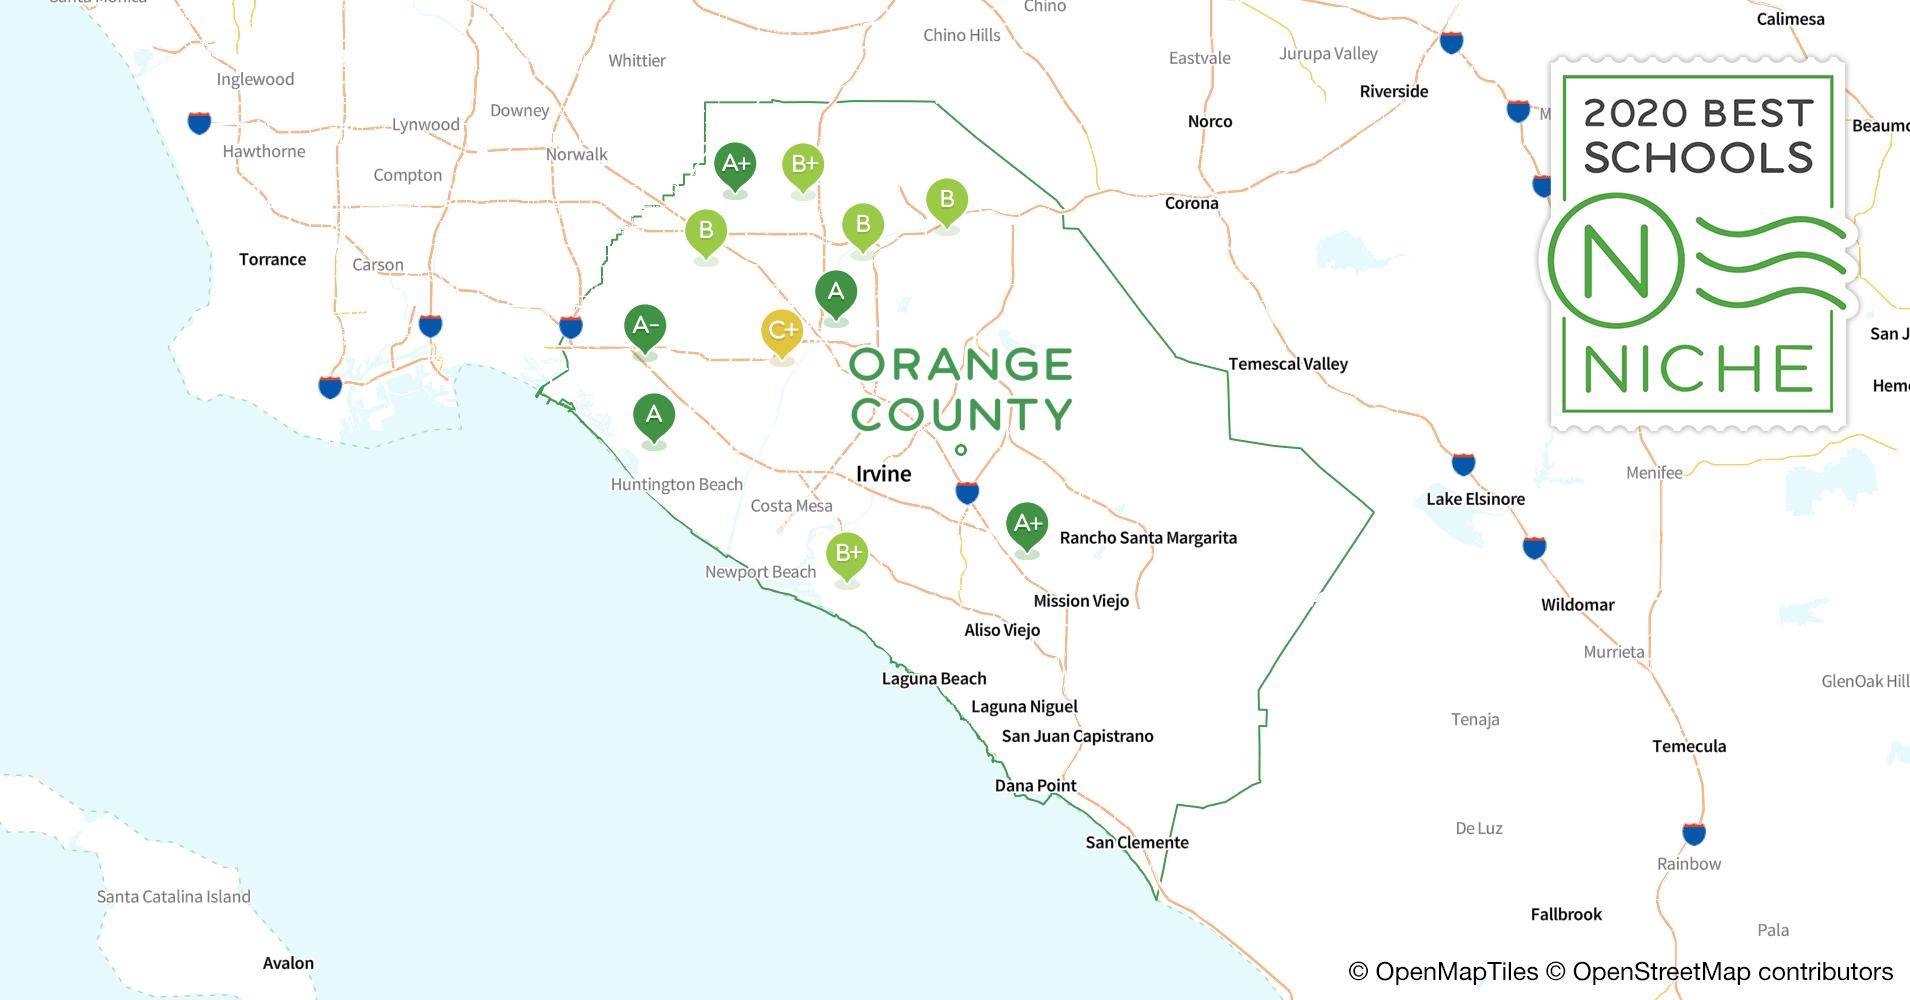 2020 Best Public High Schools in Orange County, CA - Niche